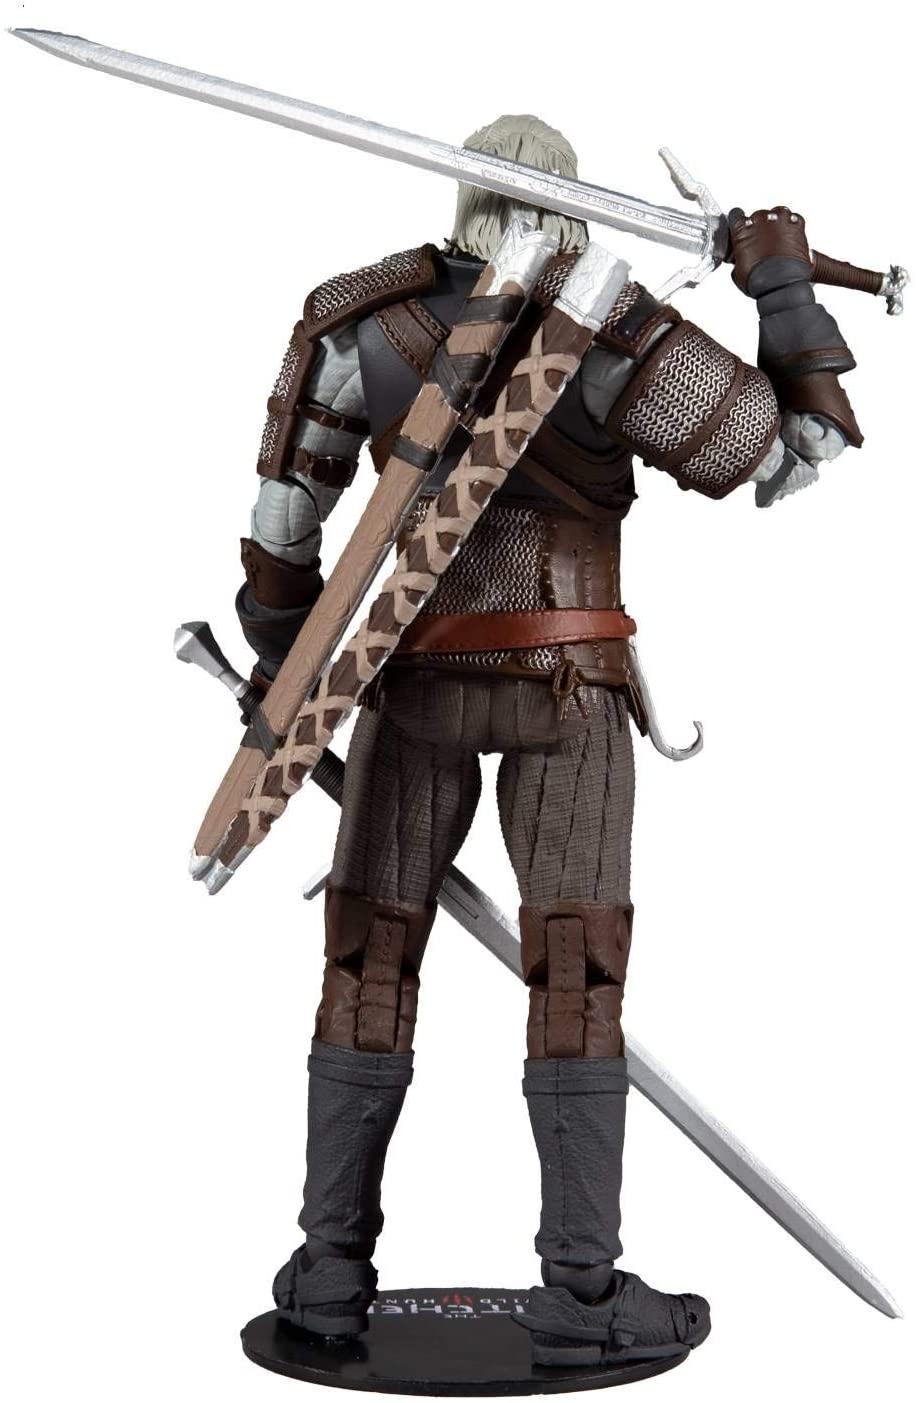 McFarlane The Witcher Gaming Figures 1 Geralt of Rivia Oficial Licenciado